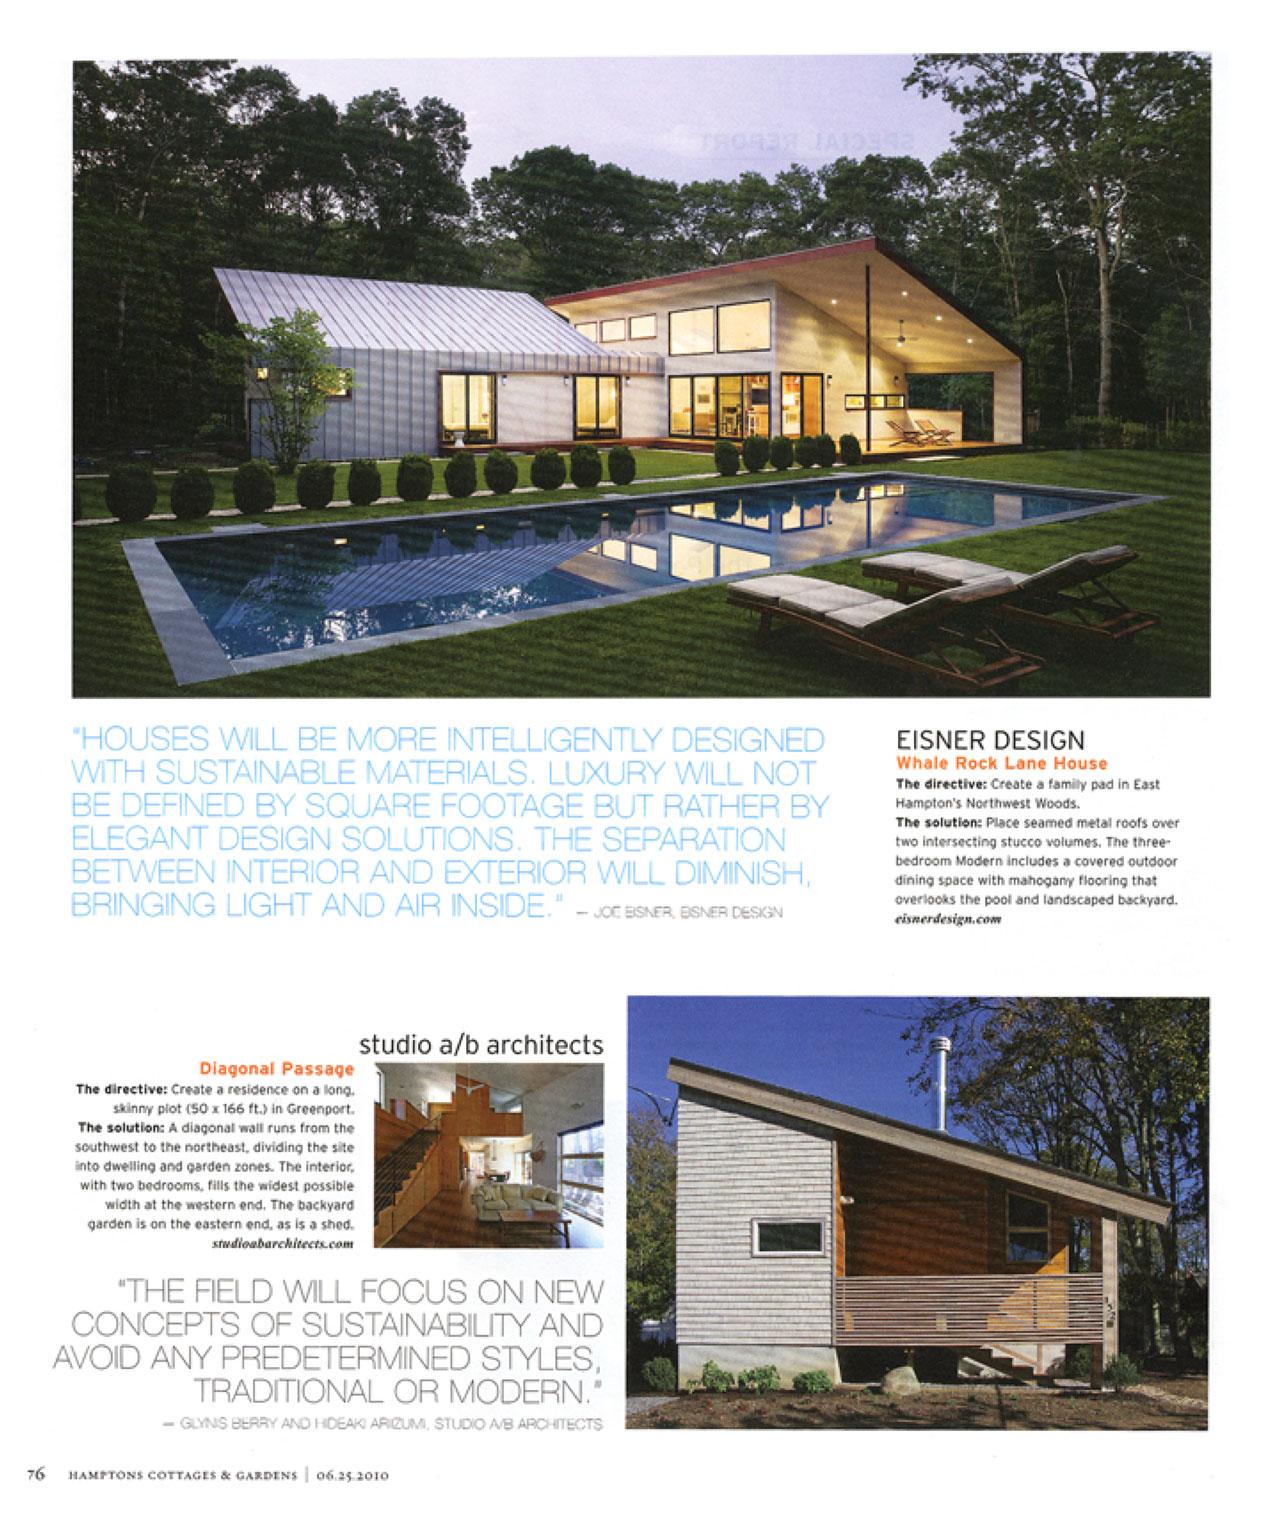 02B_News_Hampton-Cottages-Garden-03_web_w1280